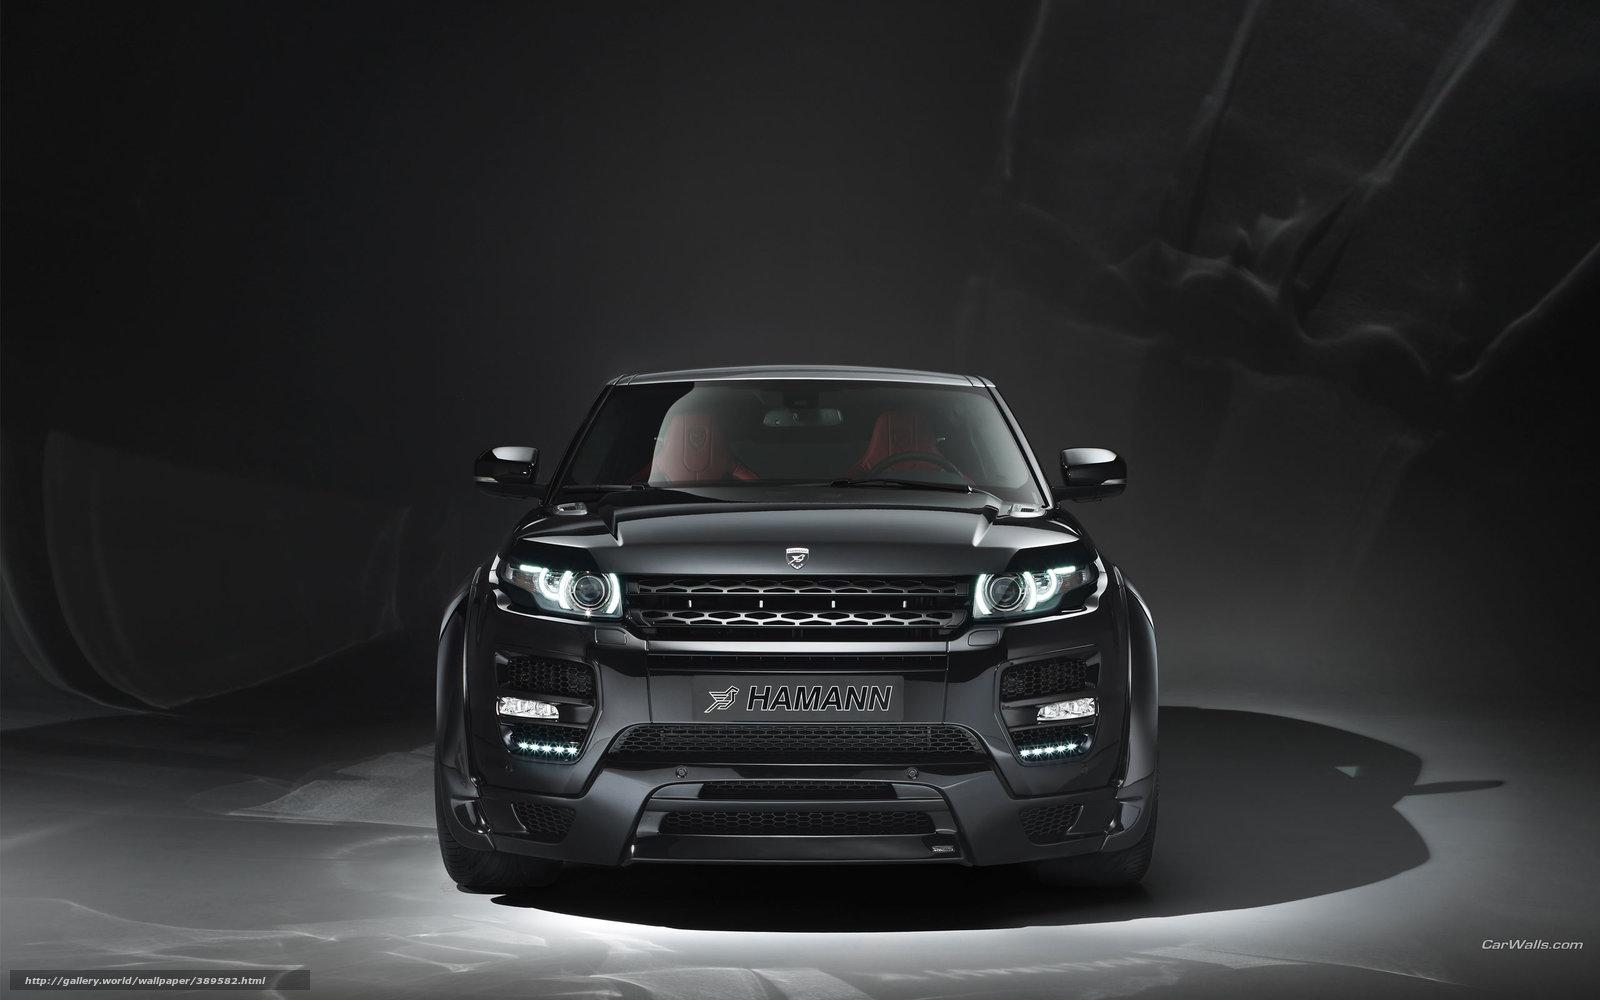 Land Rover Range Rover avto mashiny avtomobili X (www wallpapers